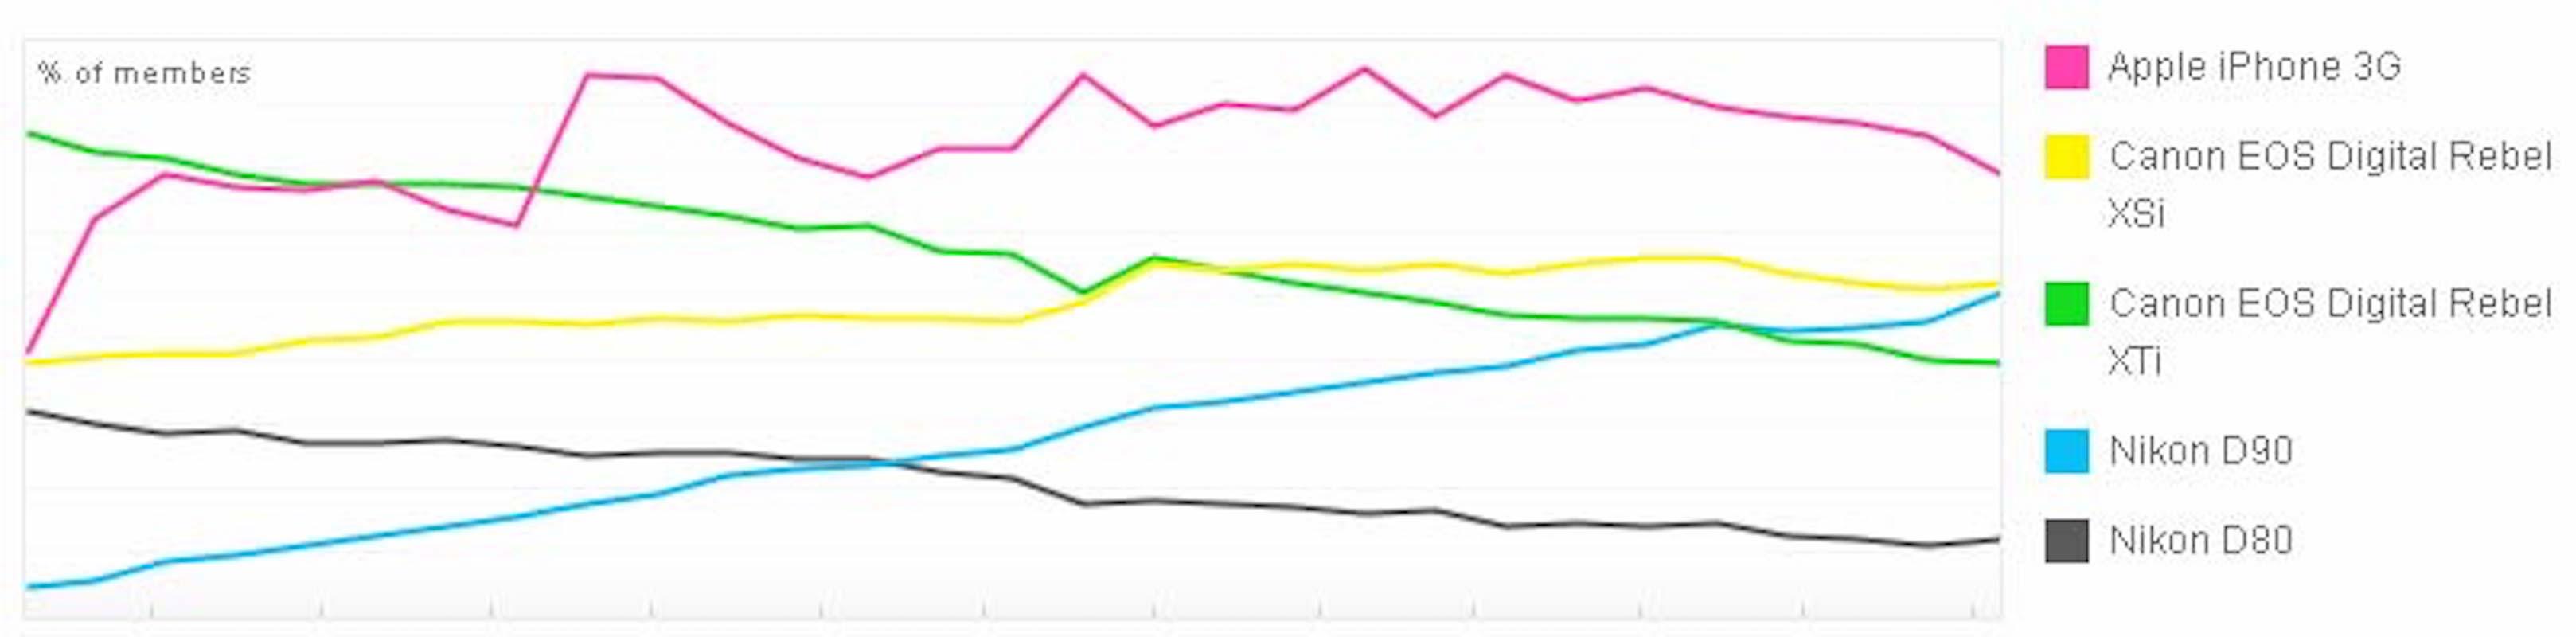 Flickr-iPhone-camera-statistic